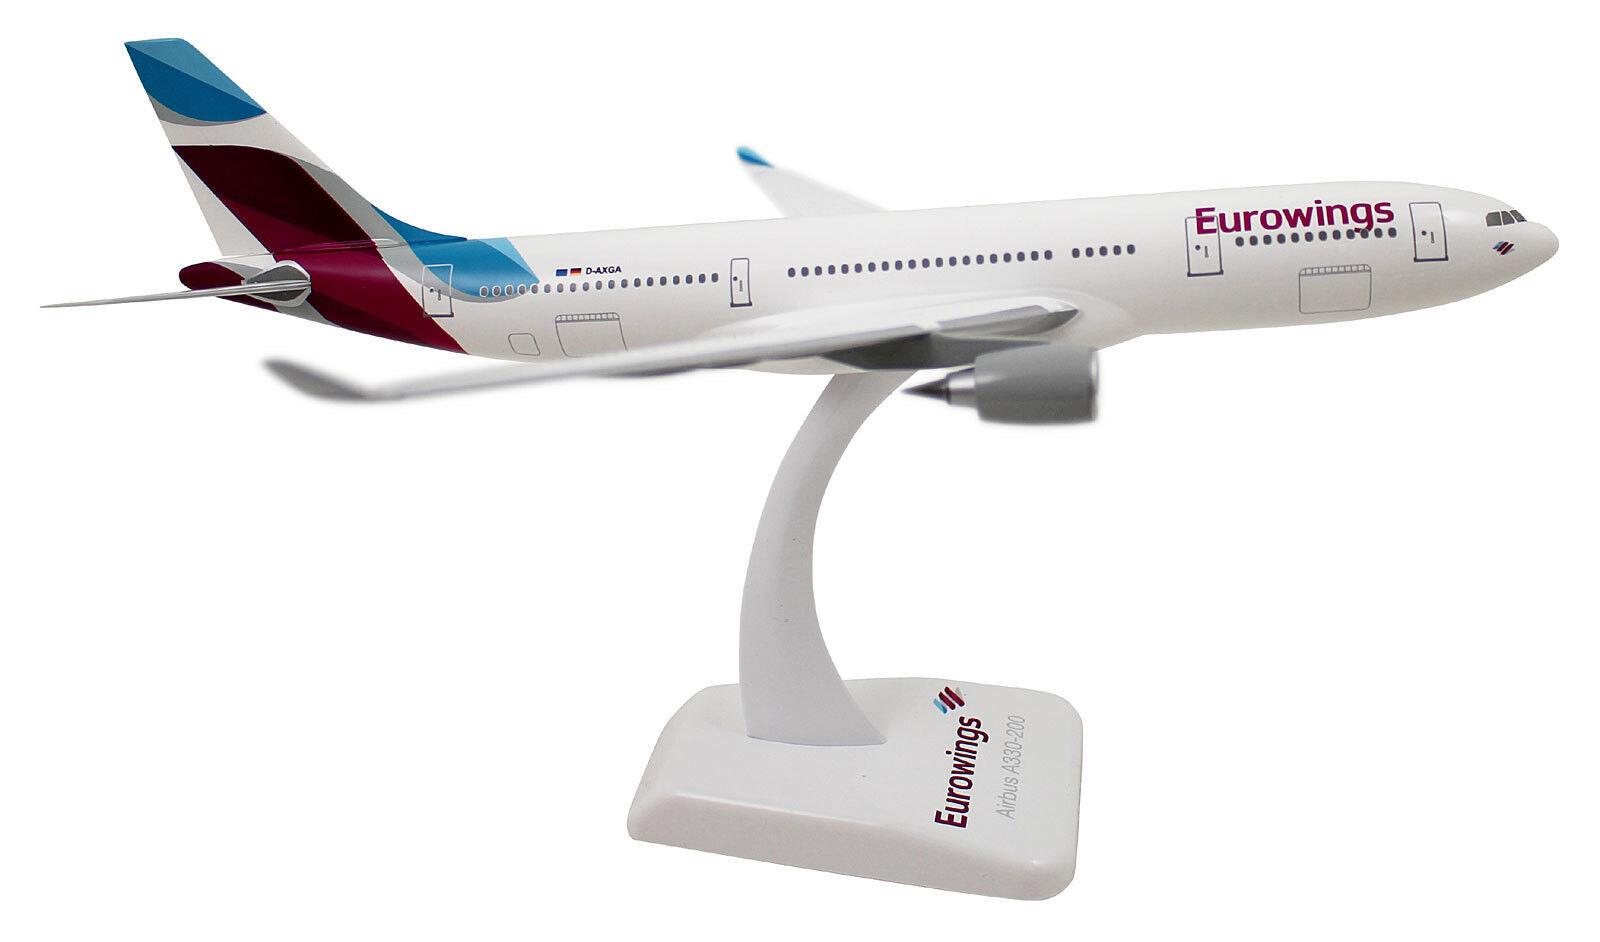 Eurowings Airbus a330-200 1 200 limox wings ew02 modèle d'avion NEUF D-axga a330